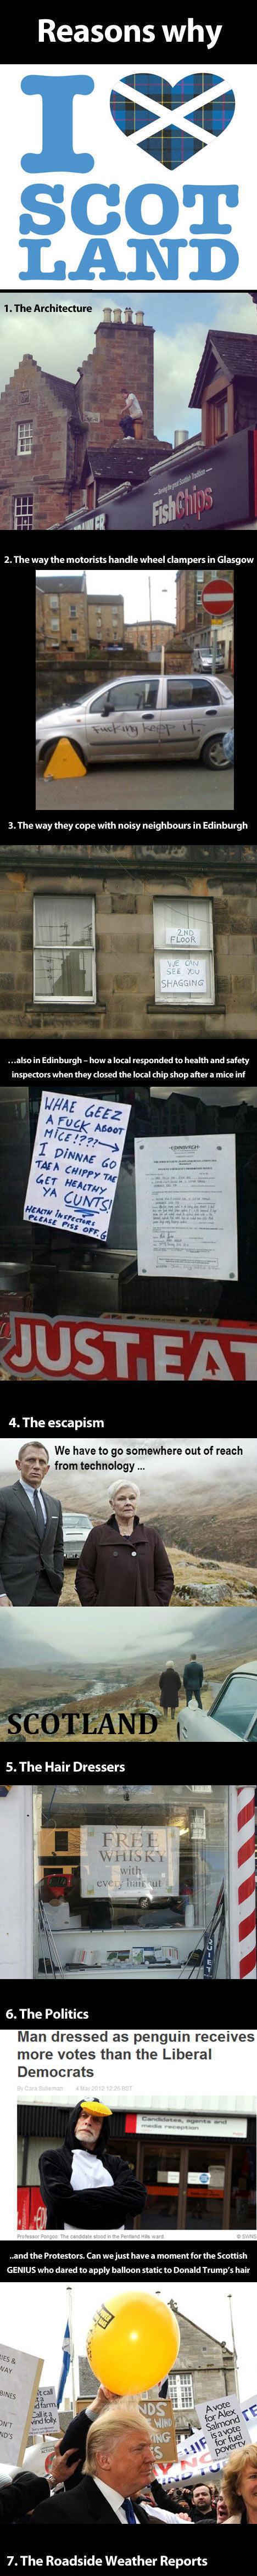 Reasons why we love Scotland...